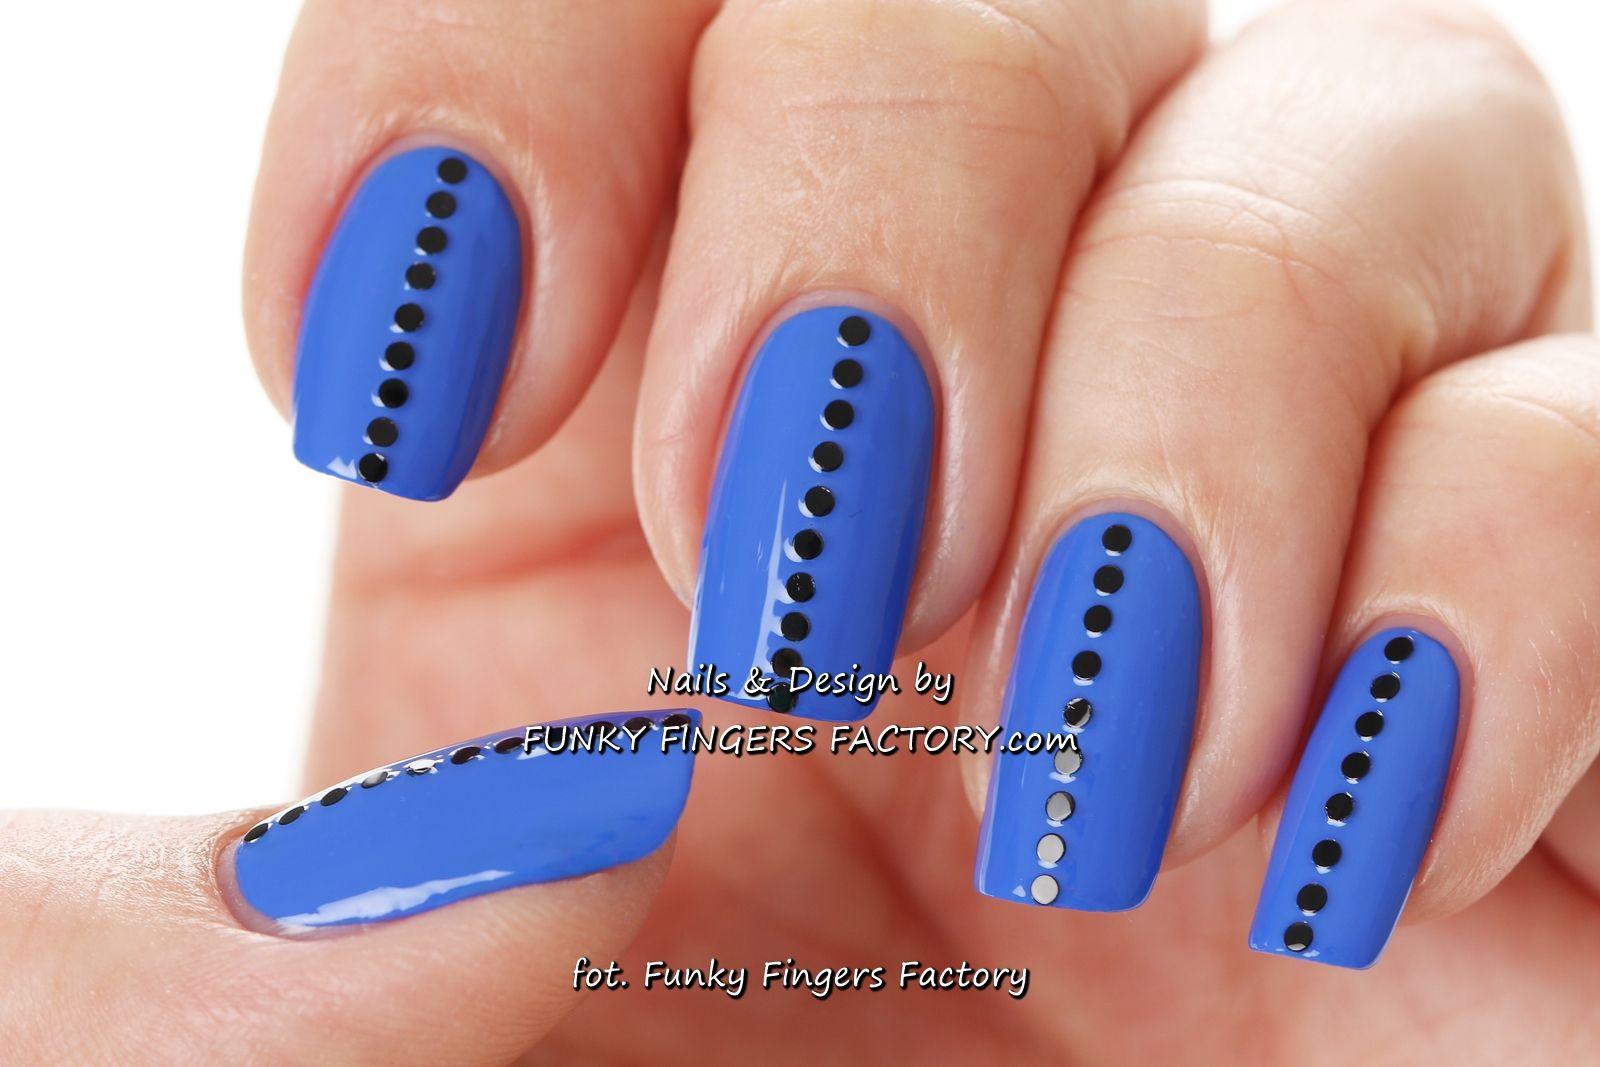 Blue Studded nails by www.funkyfingersfactory.com